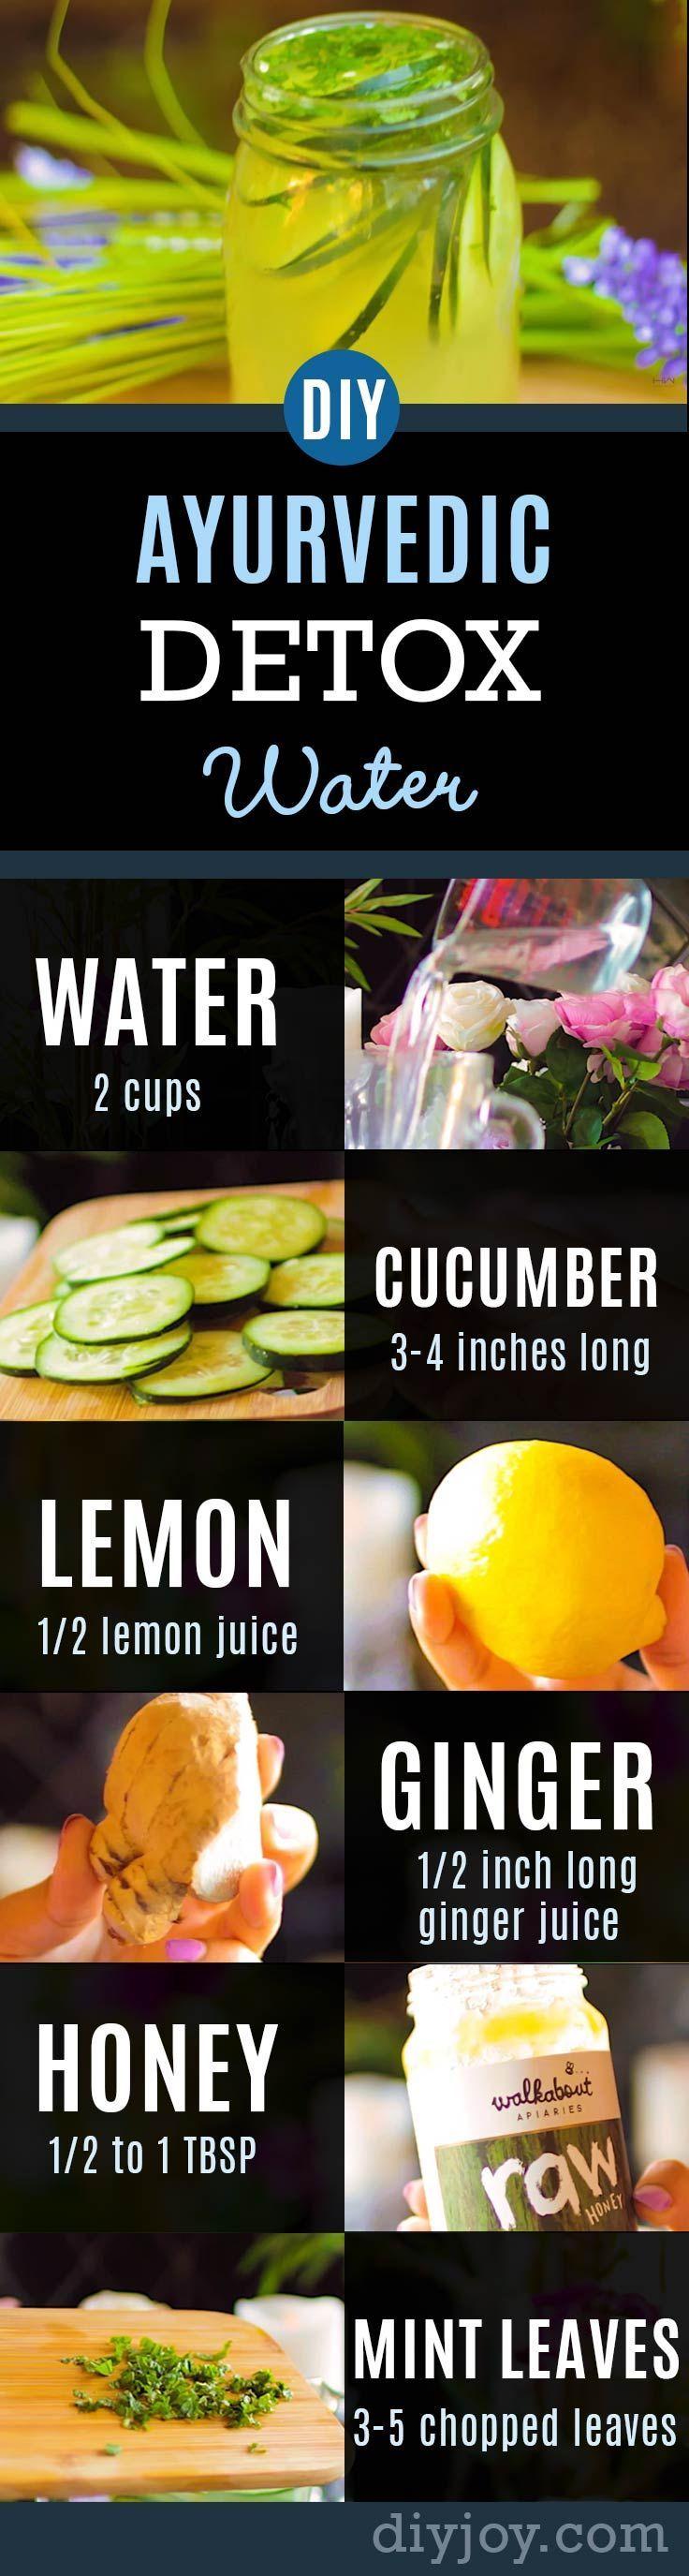 Ayurvedic Detox Water Recipe Promotes Healthy Body, Clear Skin, Weight Loss and Flat Belly, Anti-Aging   Healthy Recipes by DIY Joy Crafts diyjoy.com/...